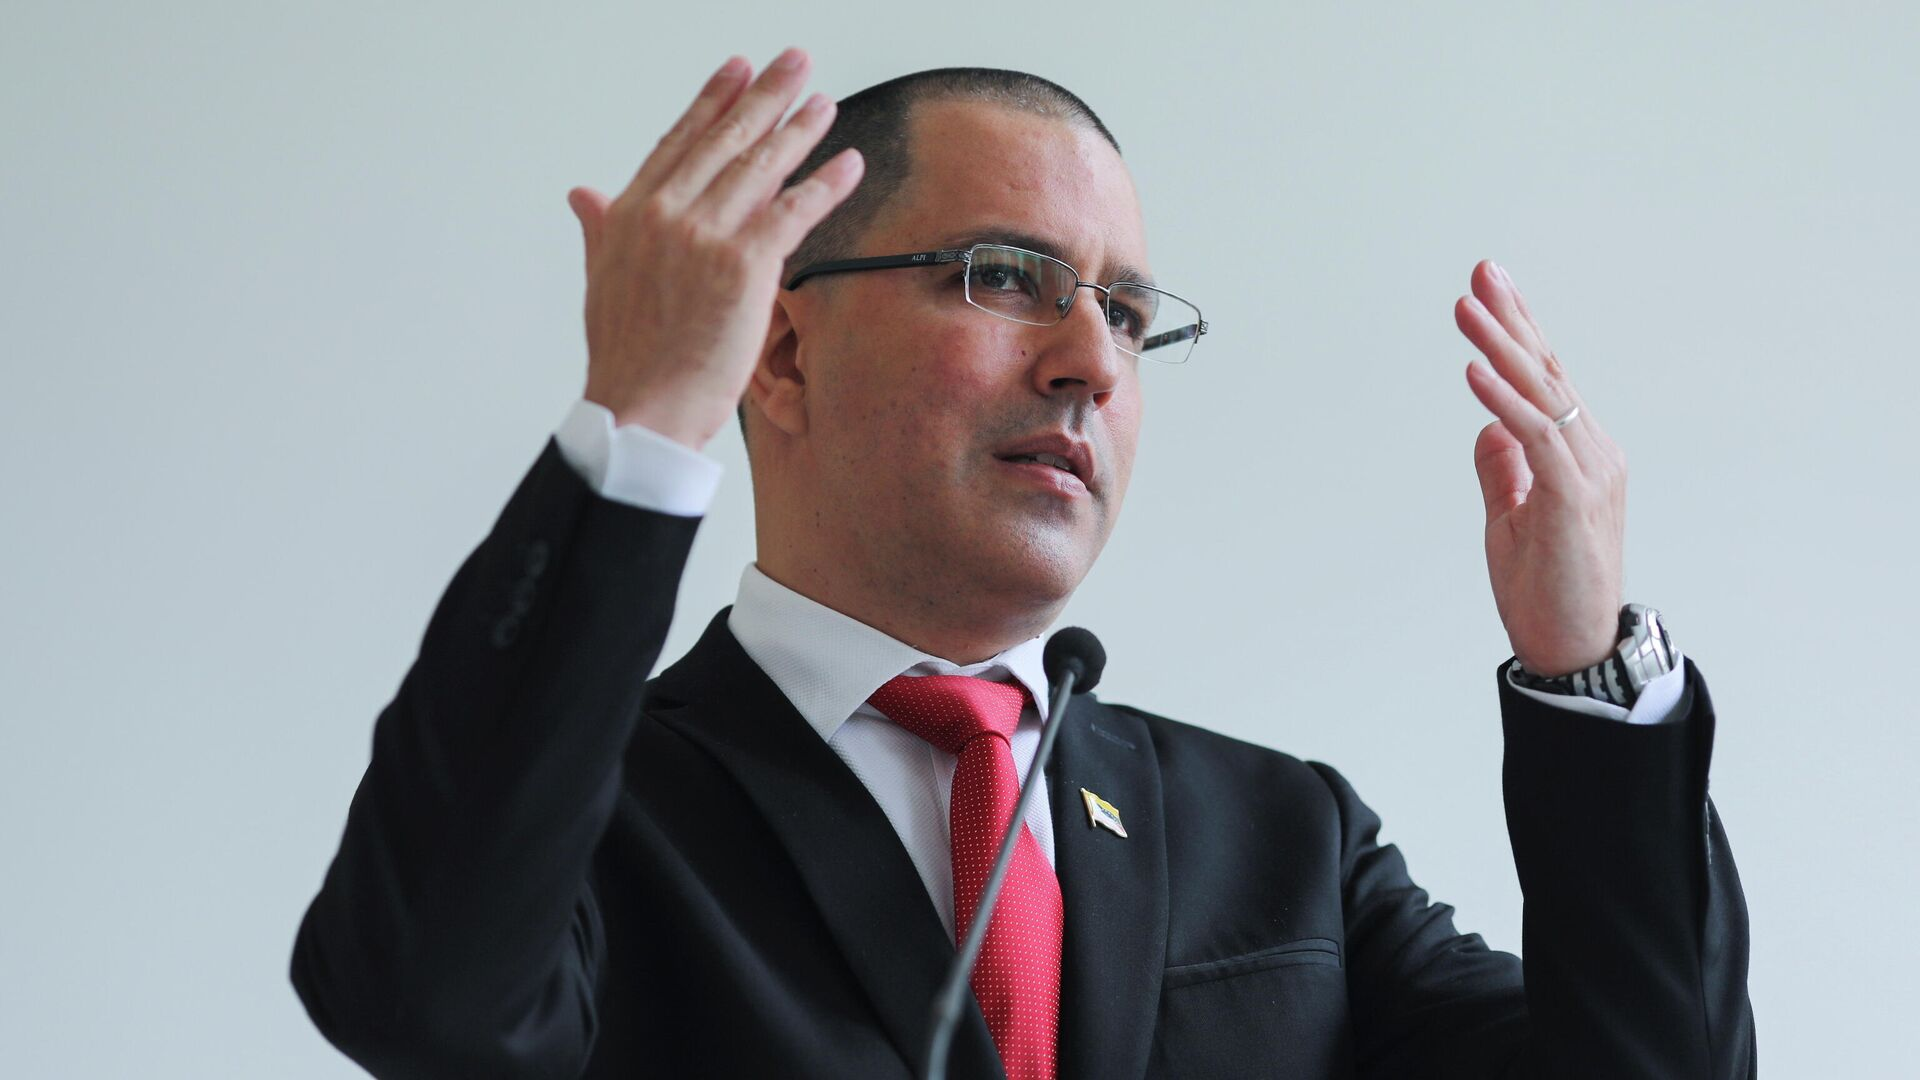 Jorge Arreaza, canciller de Venezuela - Sputnik Mundo, 1920, 25.02.2021